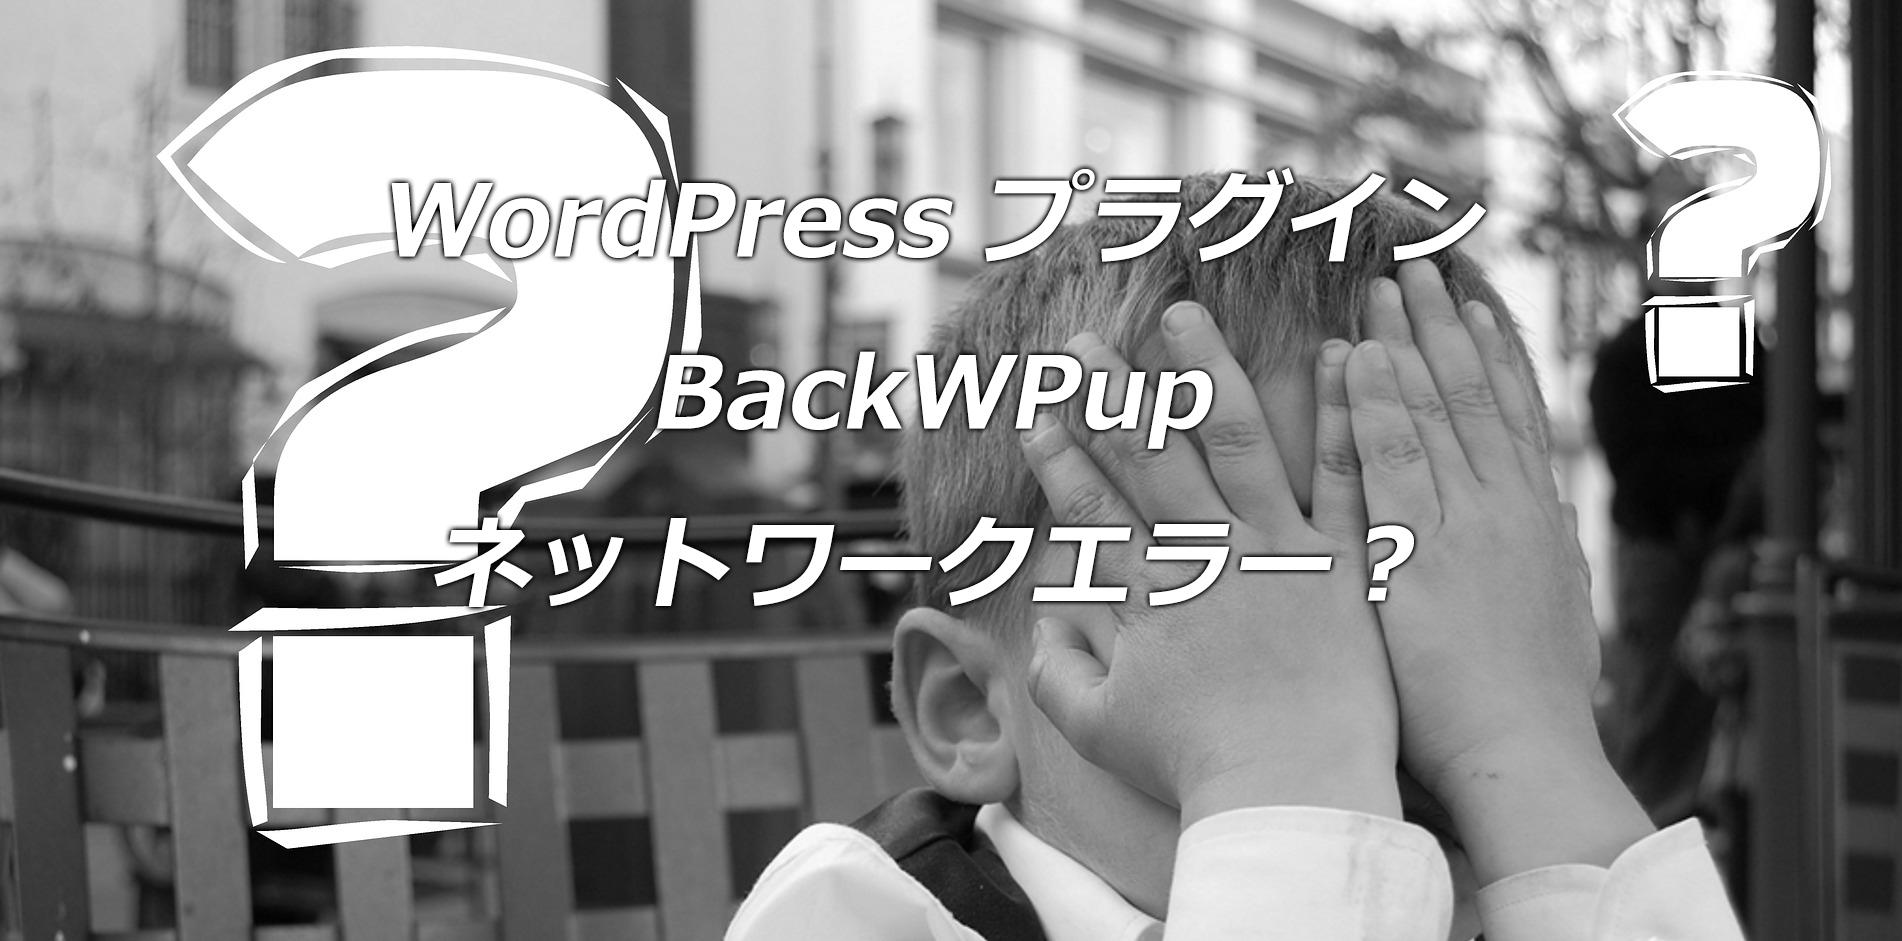 BackWPupネットワークエラーの対処方法